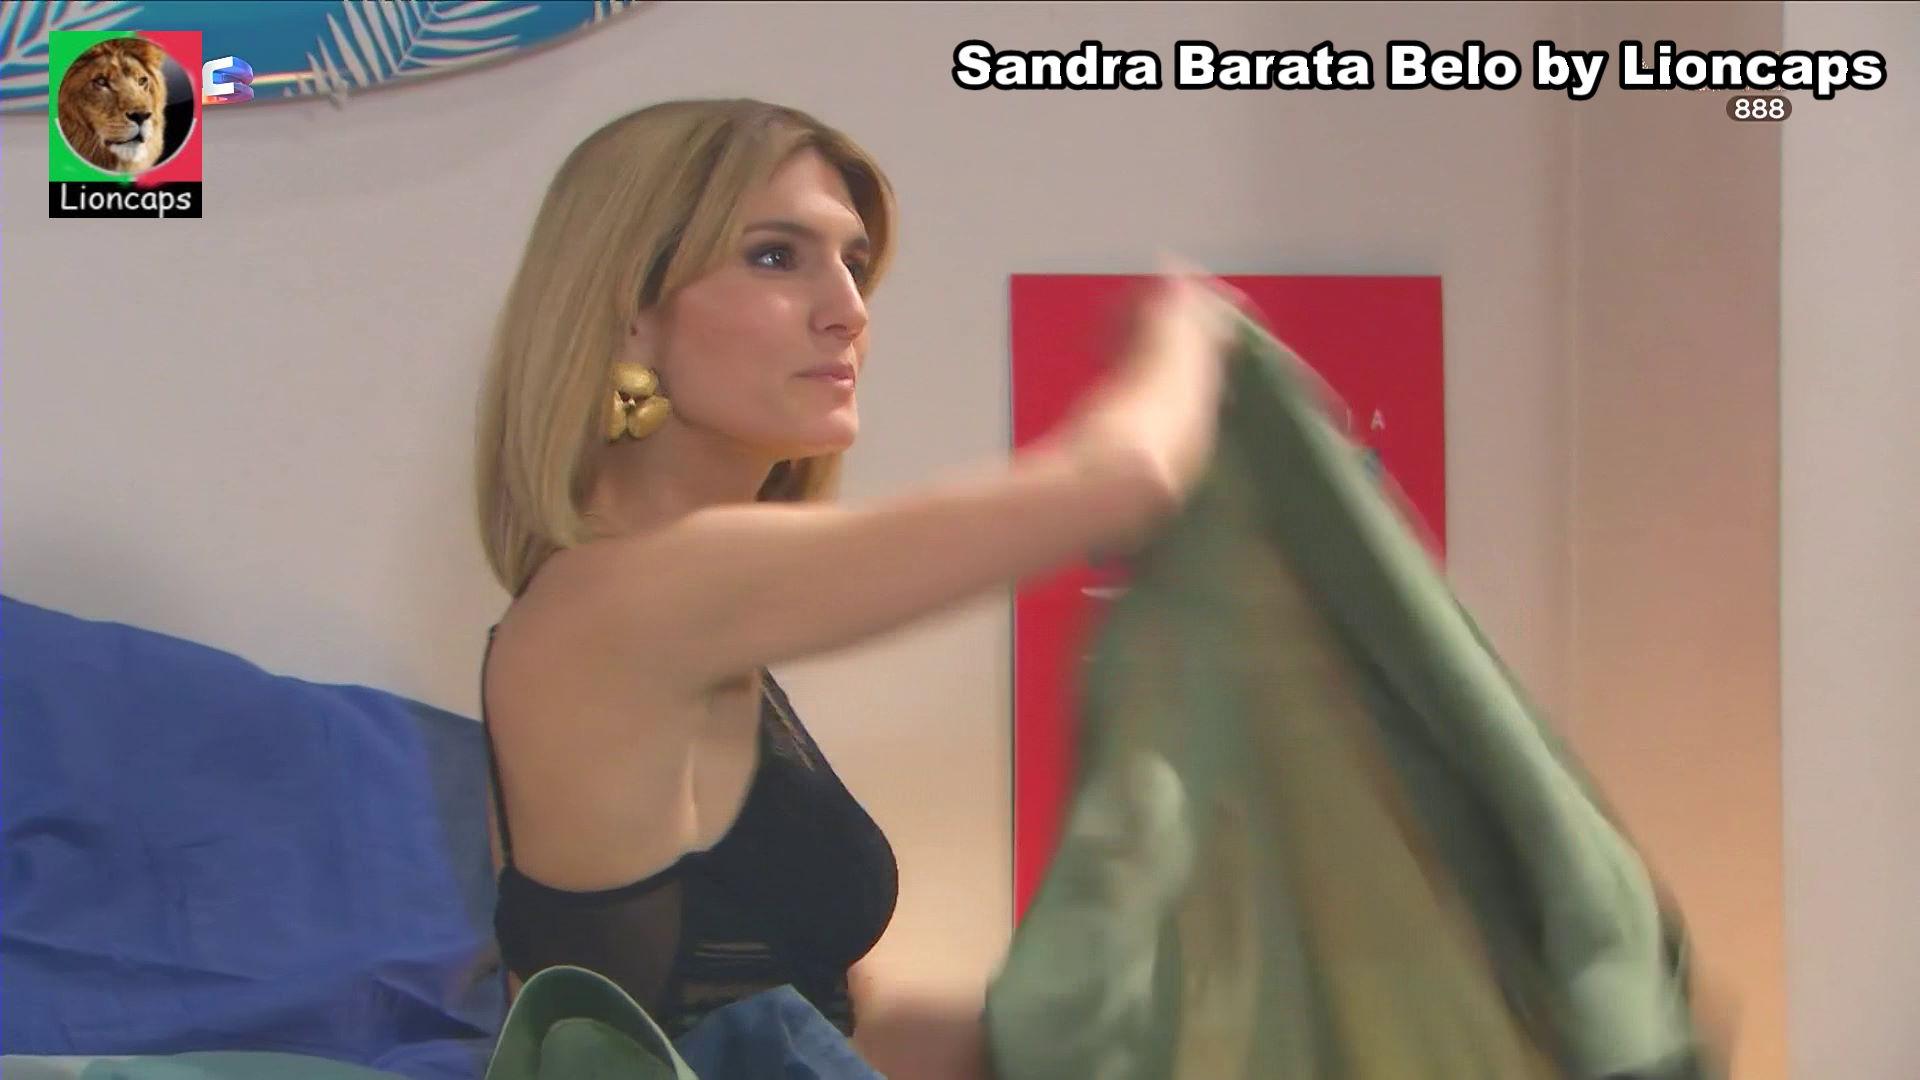 978043959_sandra_barata_belo_vs200125_1418_122_37lo.JPG